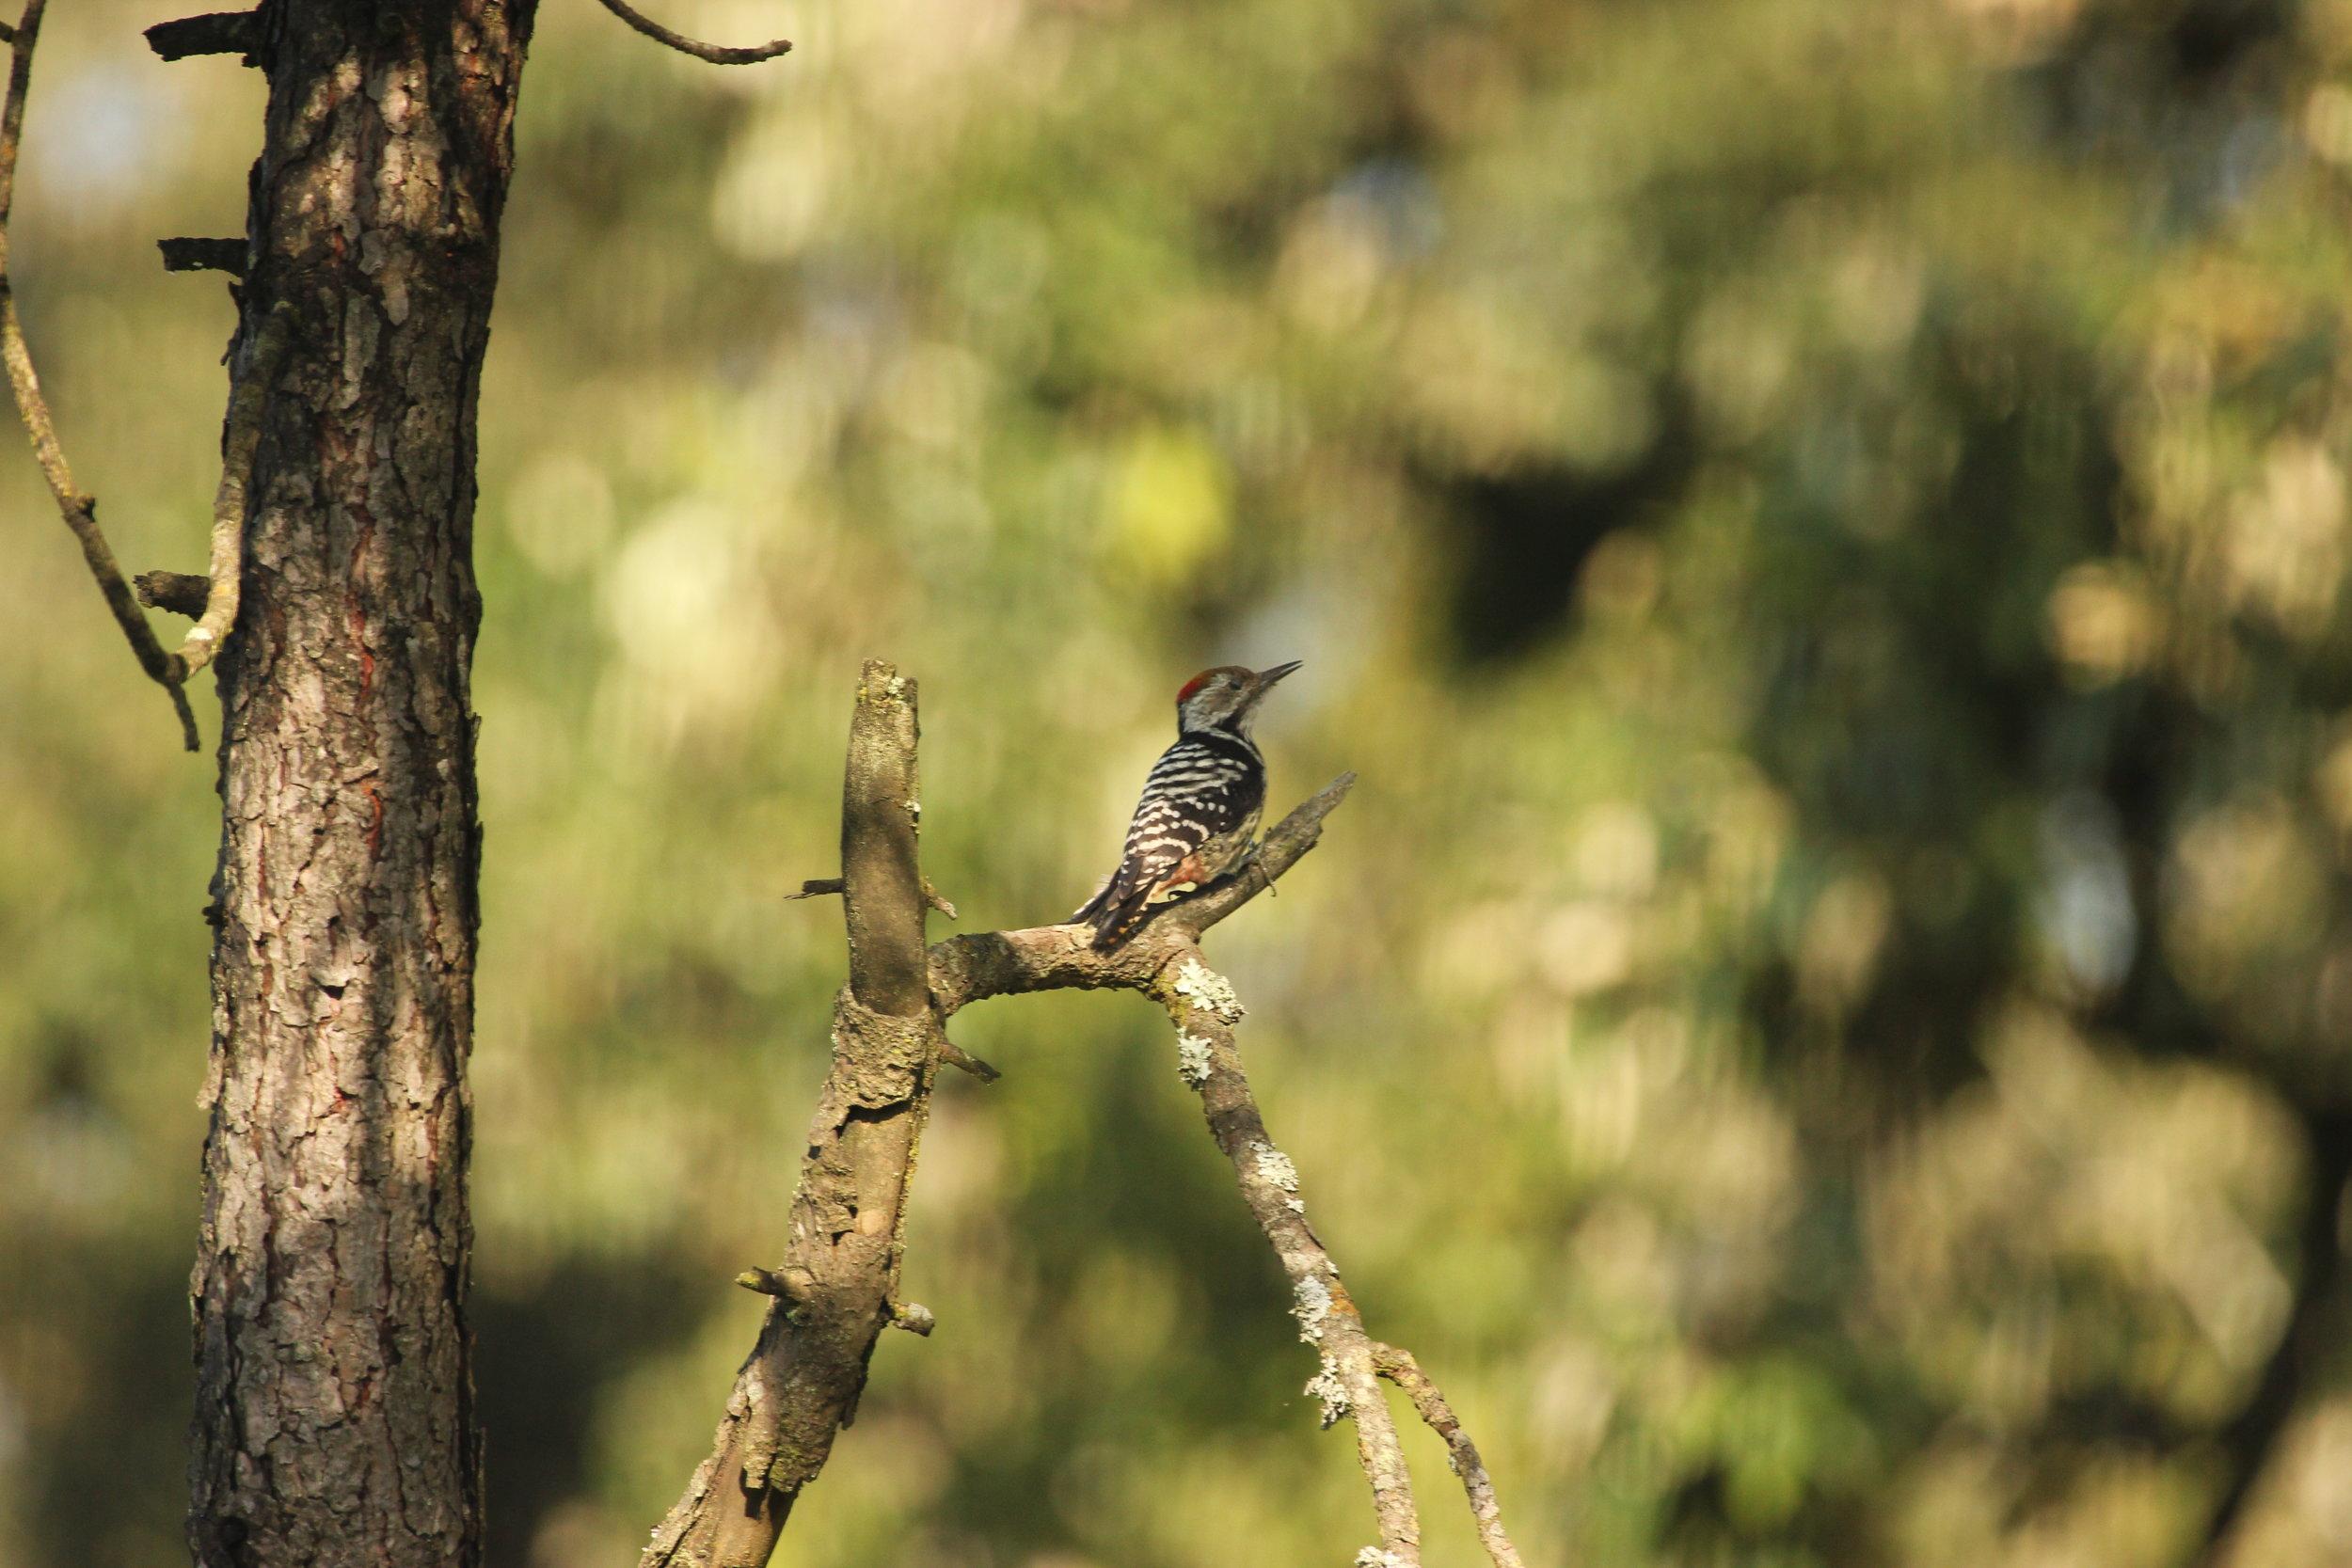 Photo Credit - Avijit Dutta